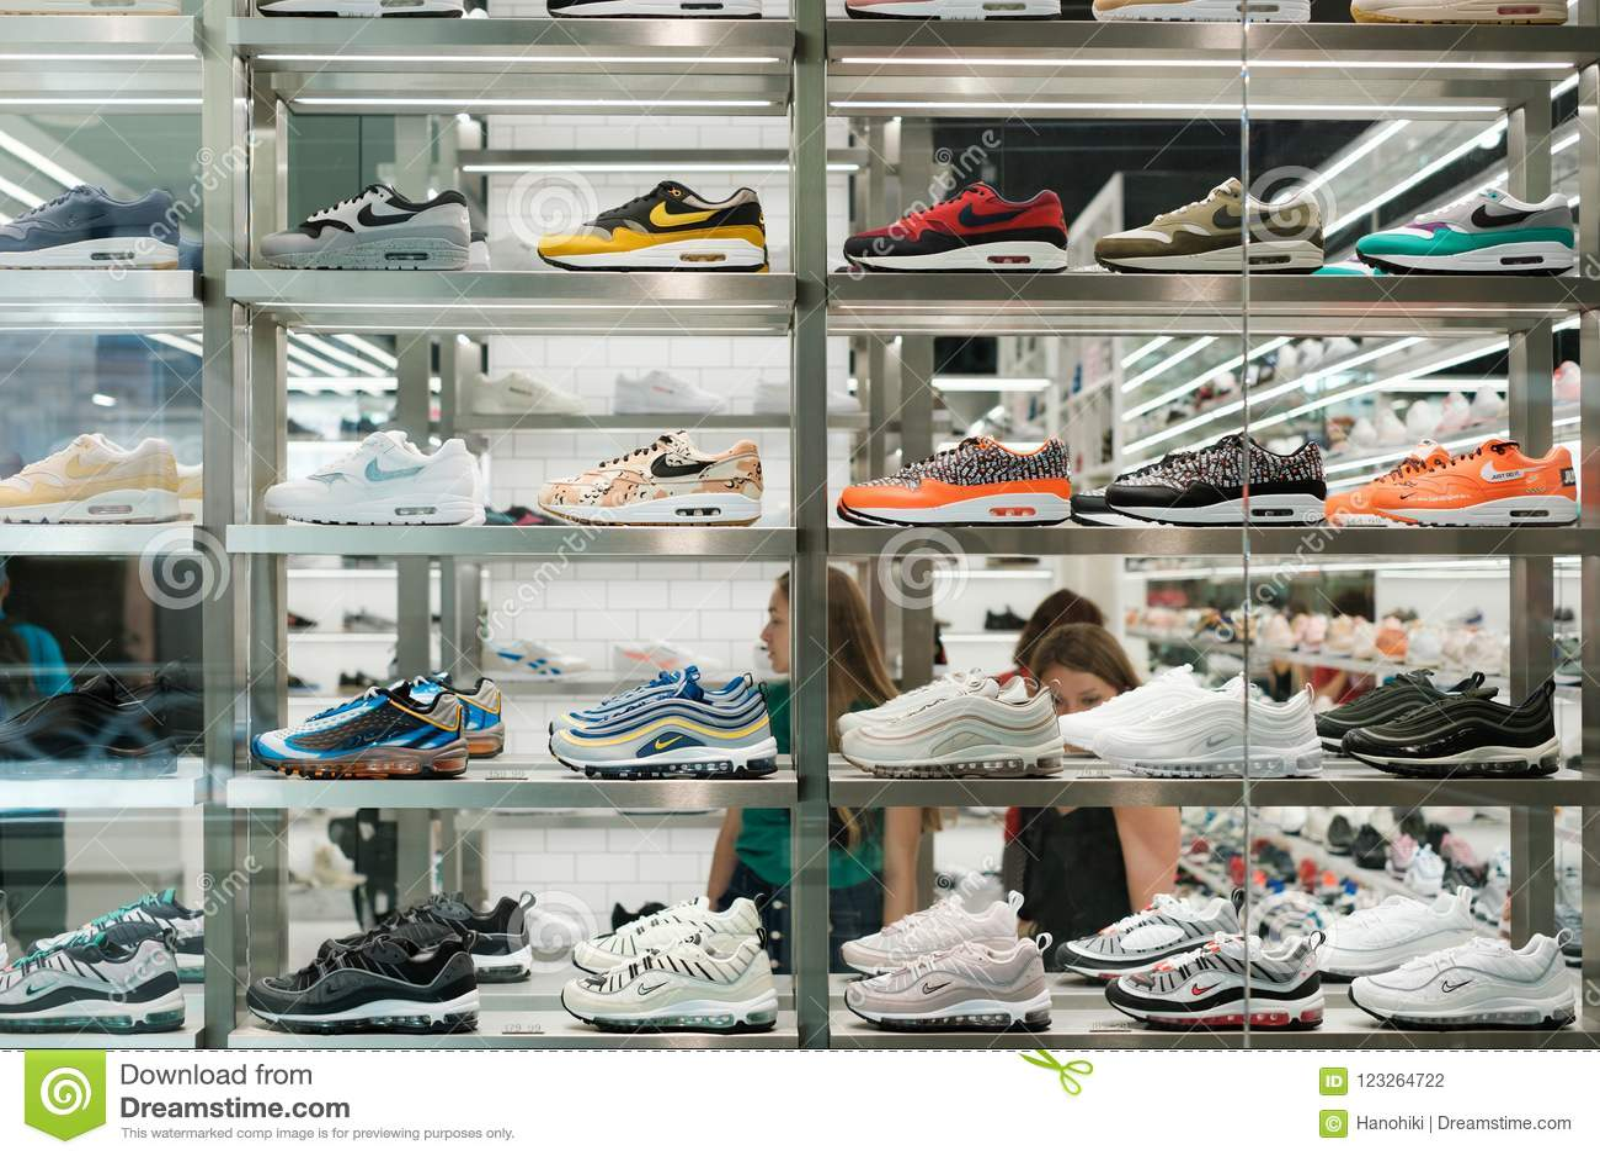 Chaussure Sport Achat Nike Mafasins Achat Chaussure wynOmvN8P0